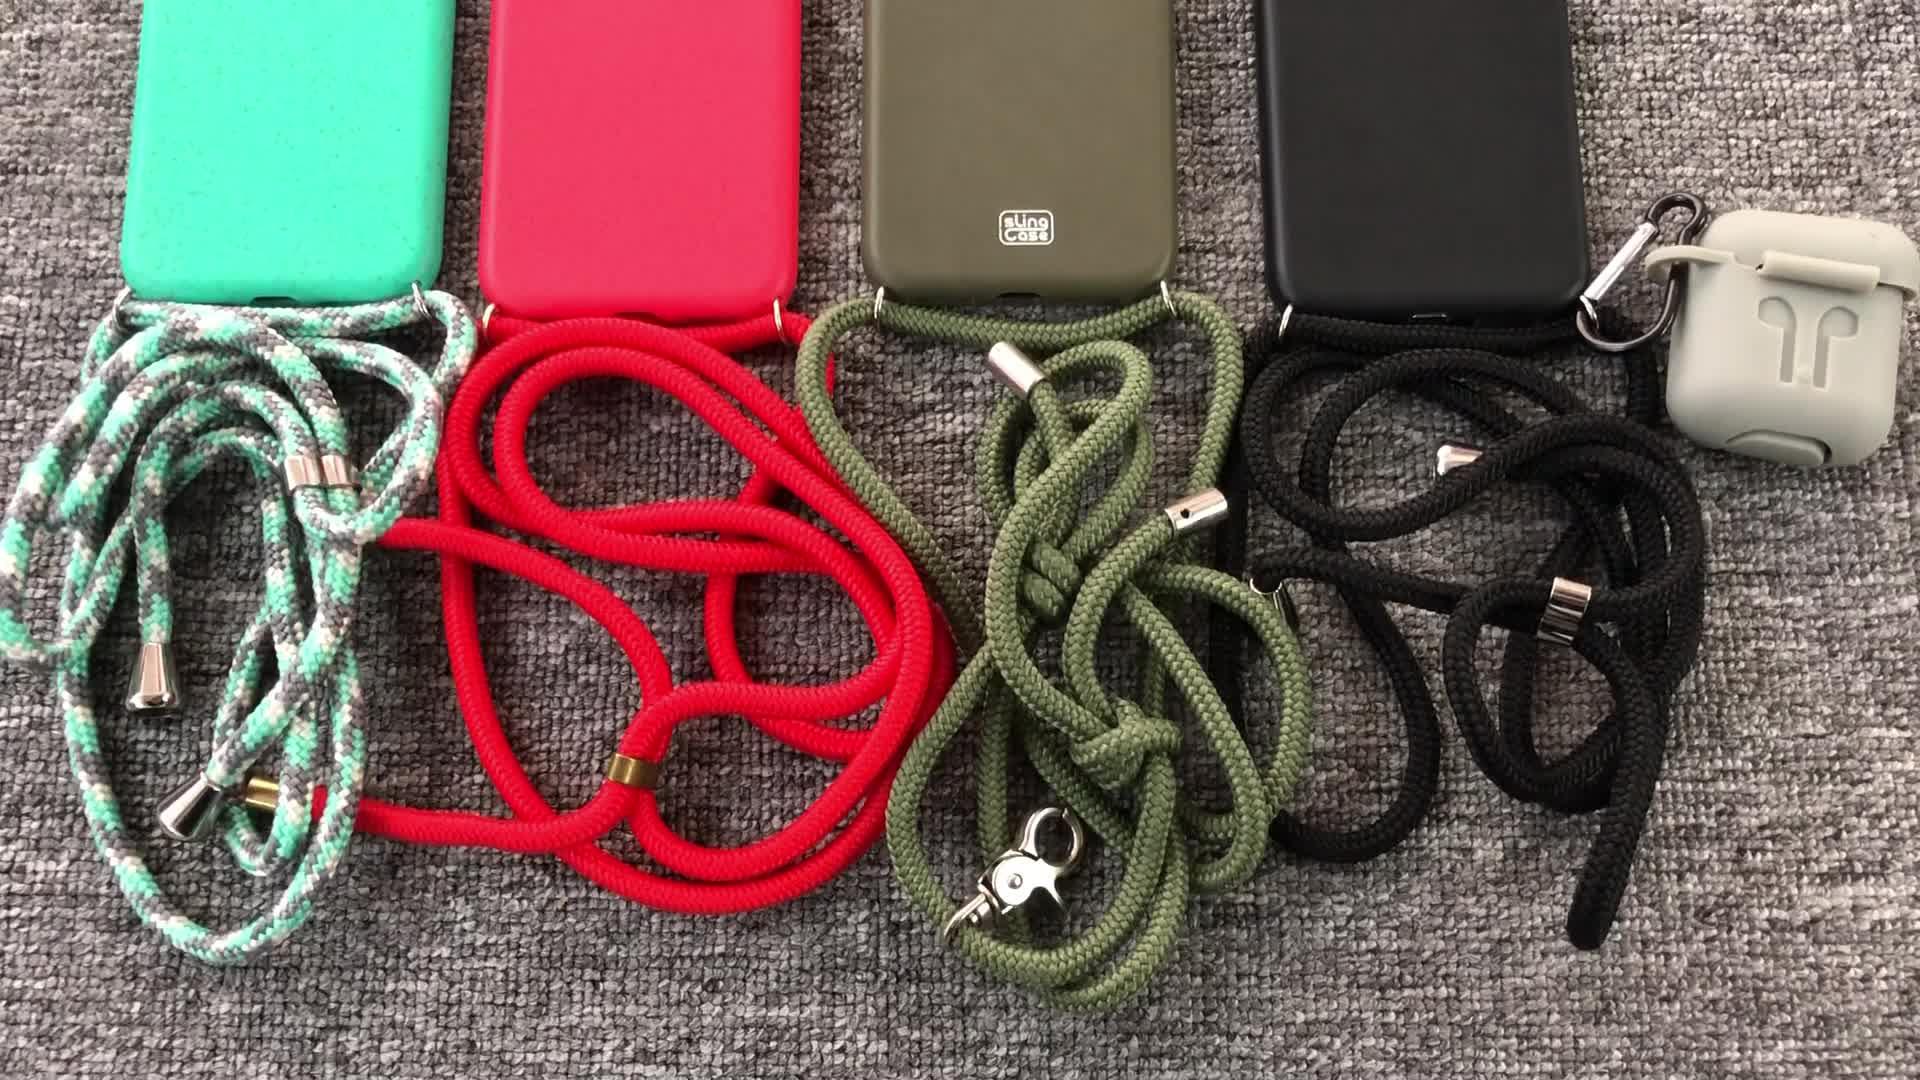 Wheat Straw Earpod Necklace Luxury Phone Case For Apple 11 Pro Max